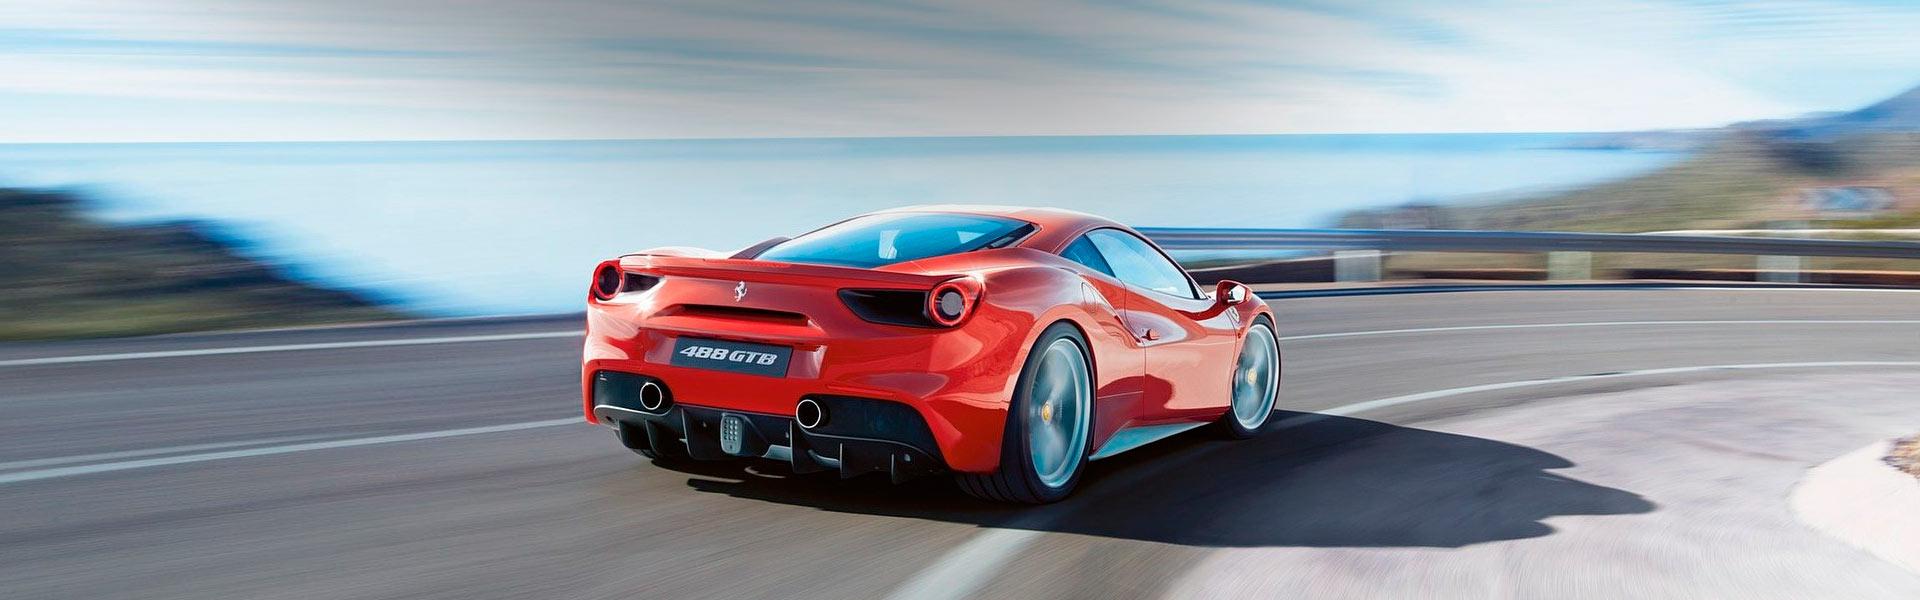 Сервис и ремонт Ferrari